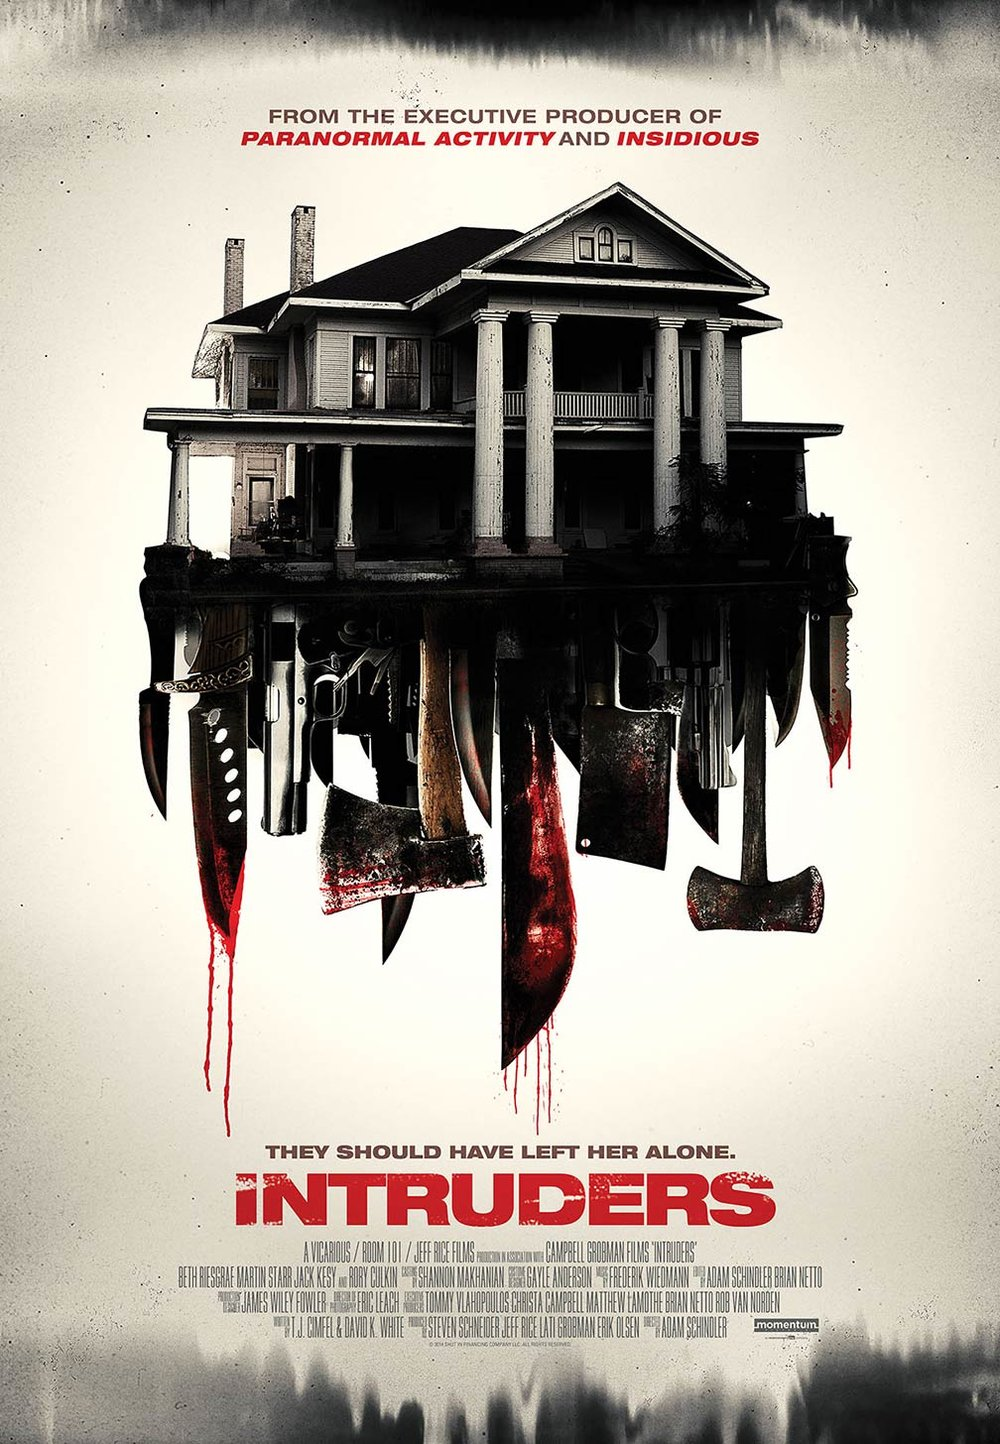 intruders-poster.jpg